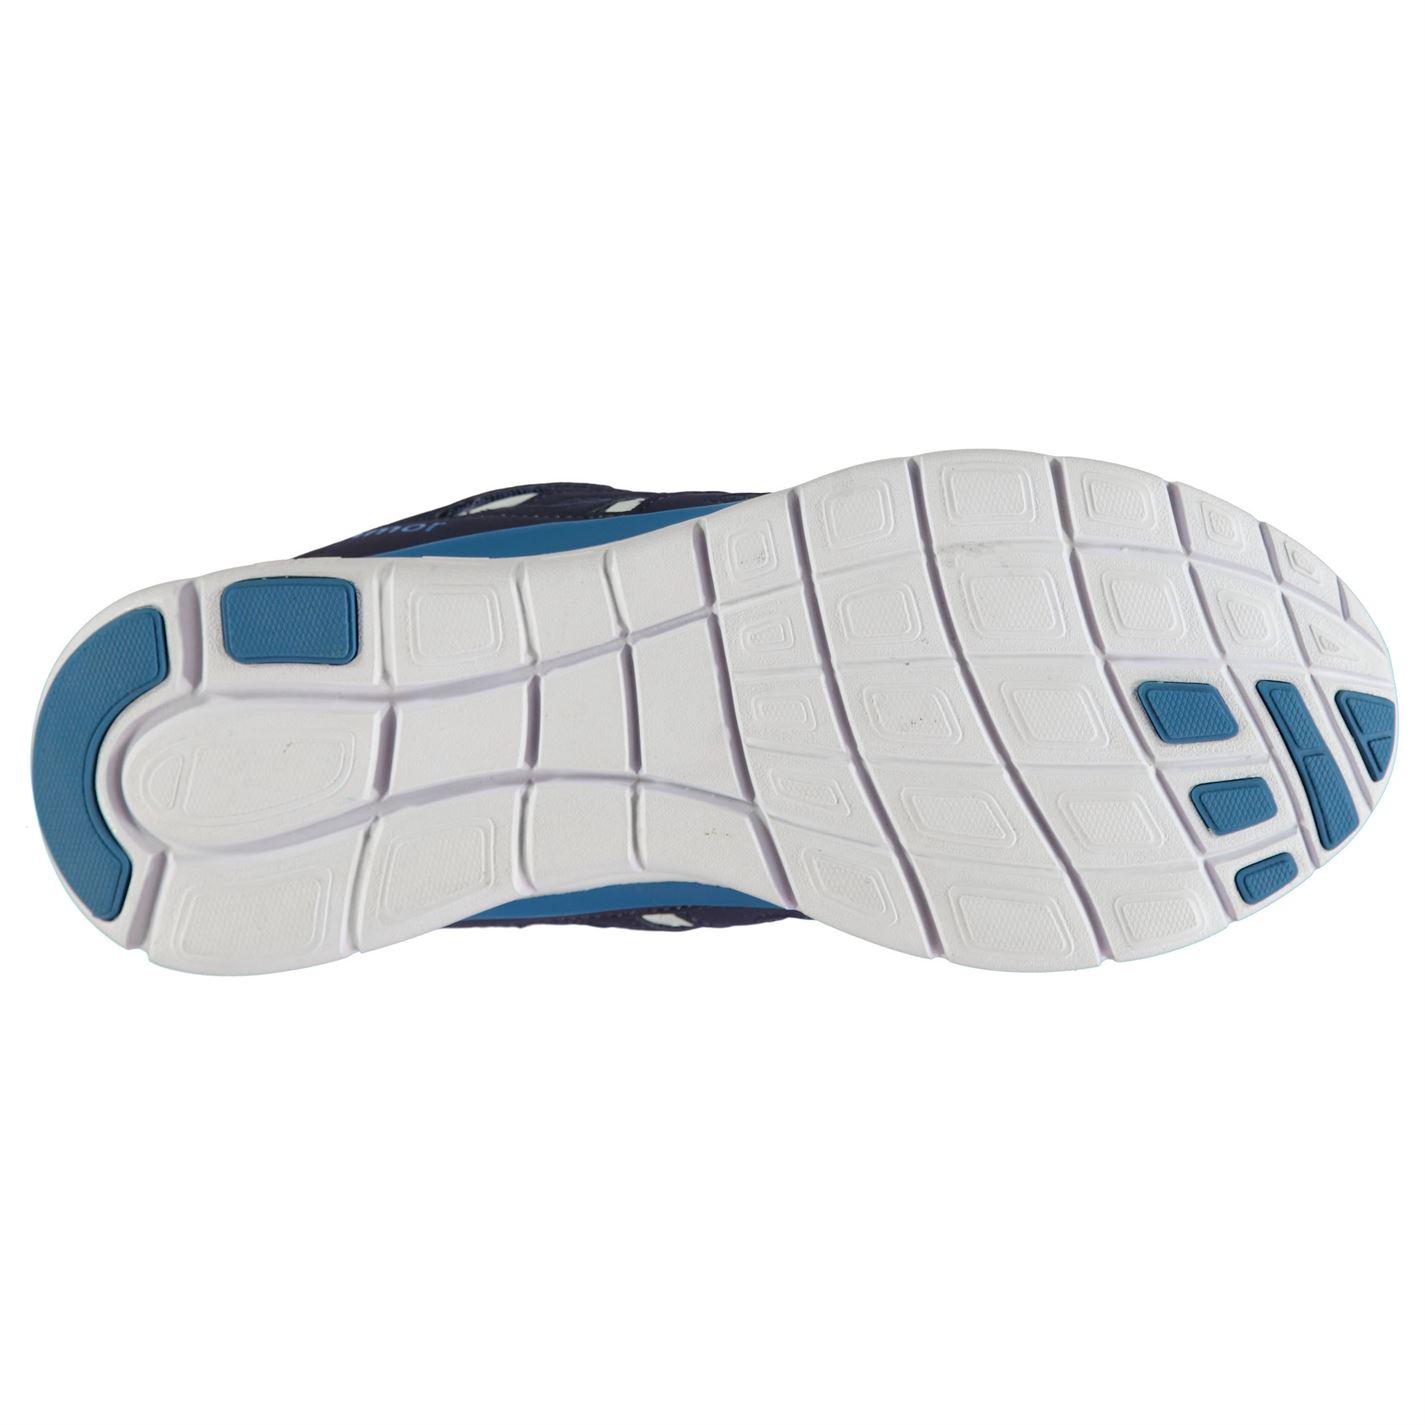 Karrimor-Mens-Duma-Trainers-Lace-Up-Sports-Running-Cross-Training-Shoes thumbnail 23